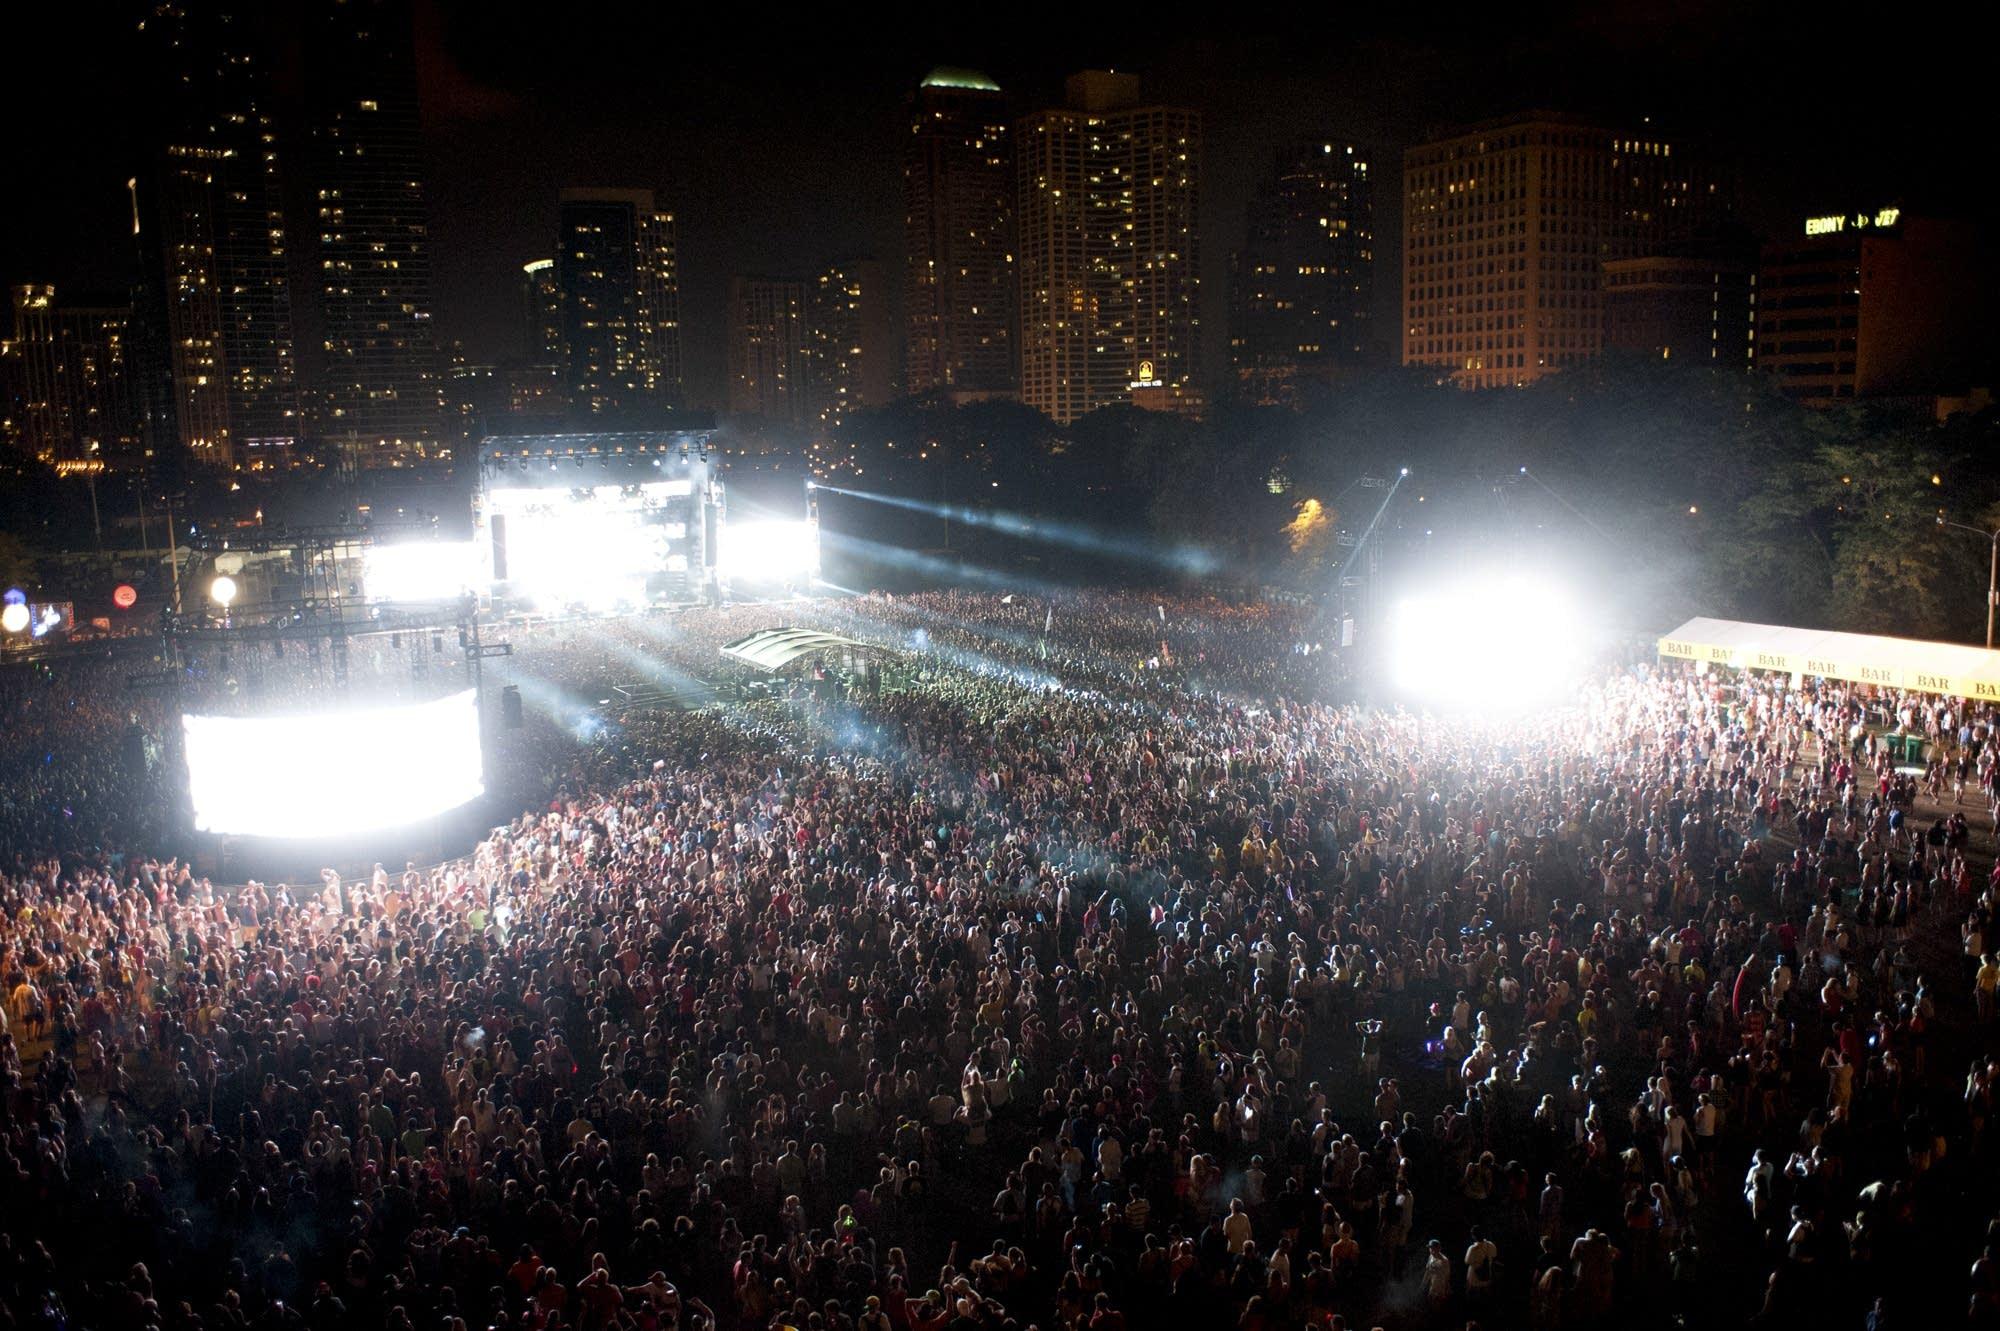 Lollapalooza August 2, 2013